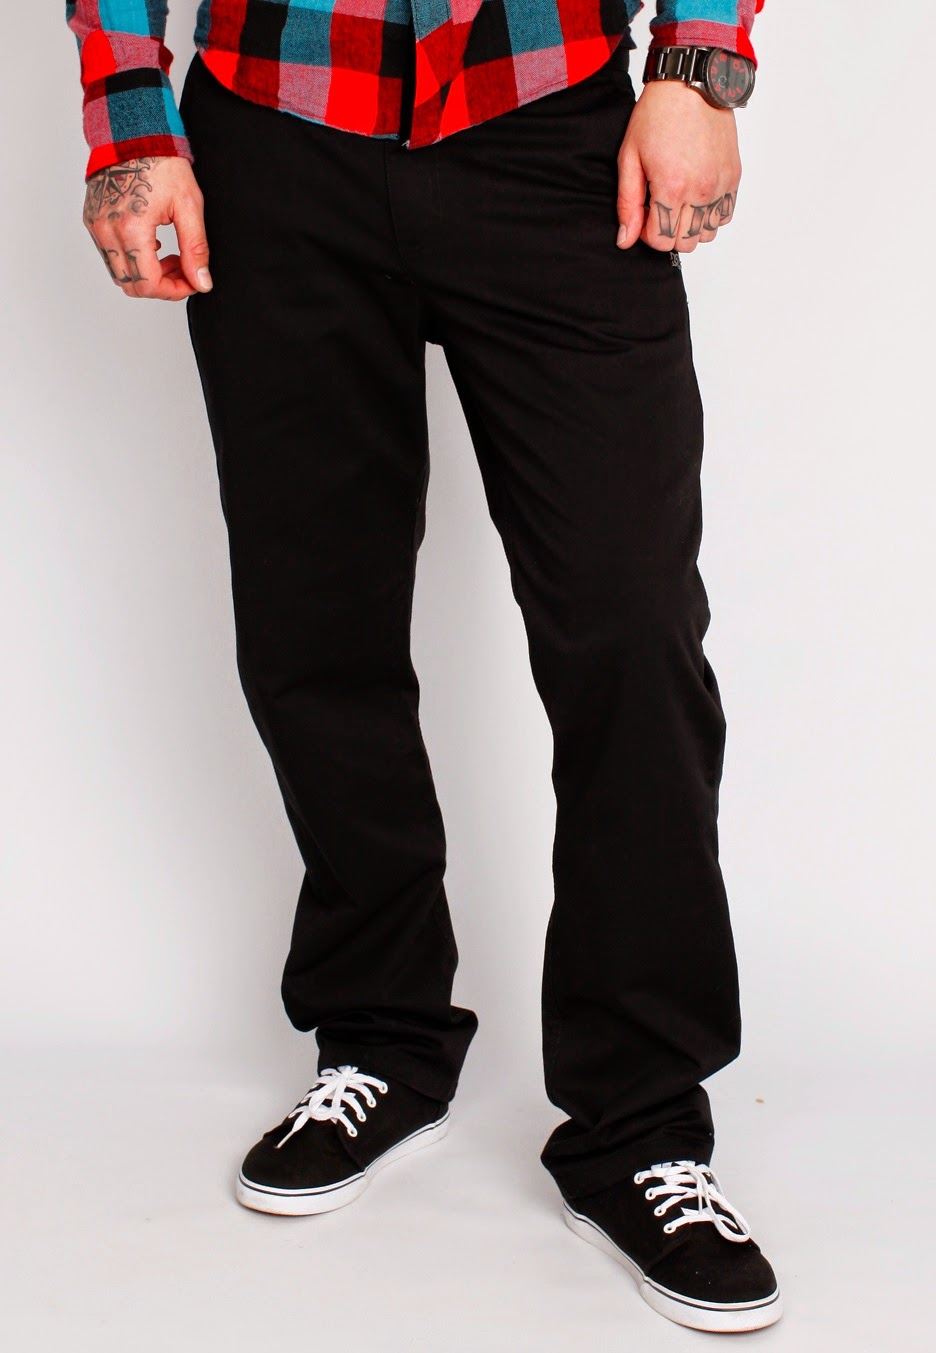 Celana Chino, Celana Jeans, Celana DC, DC Hitam